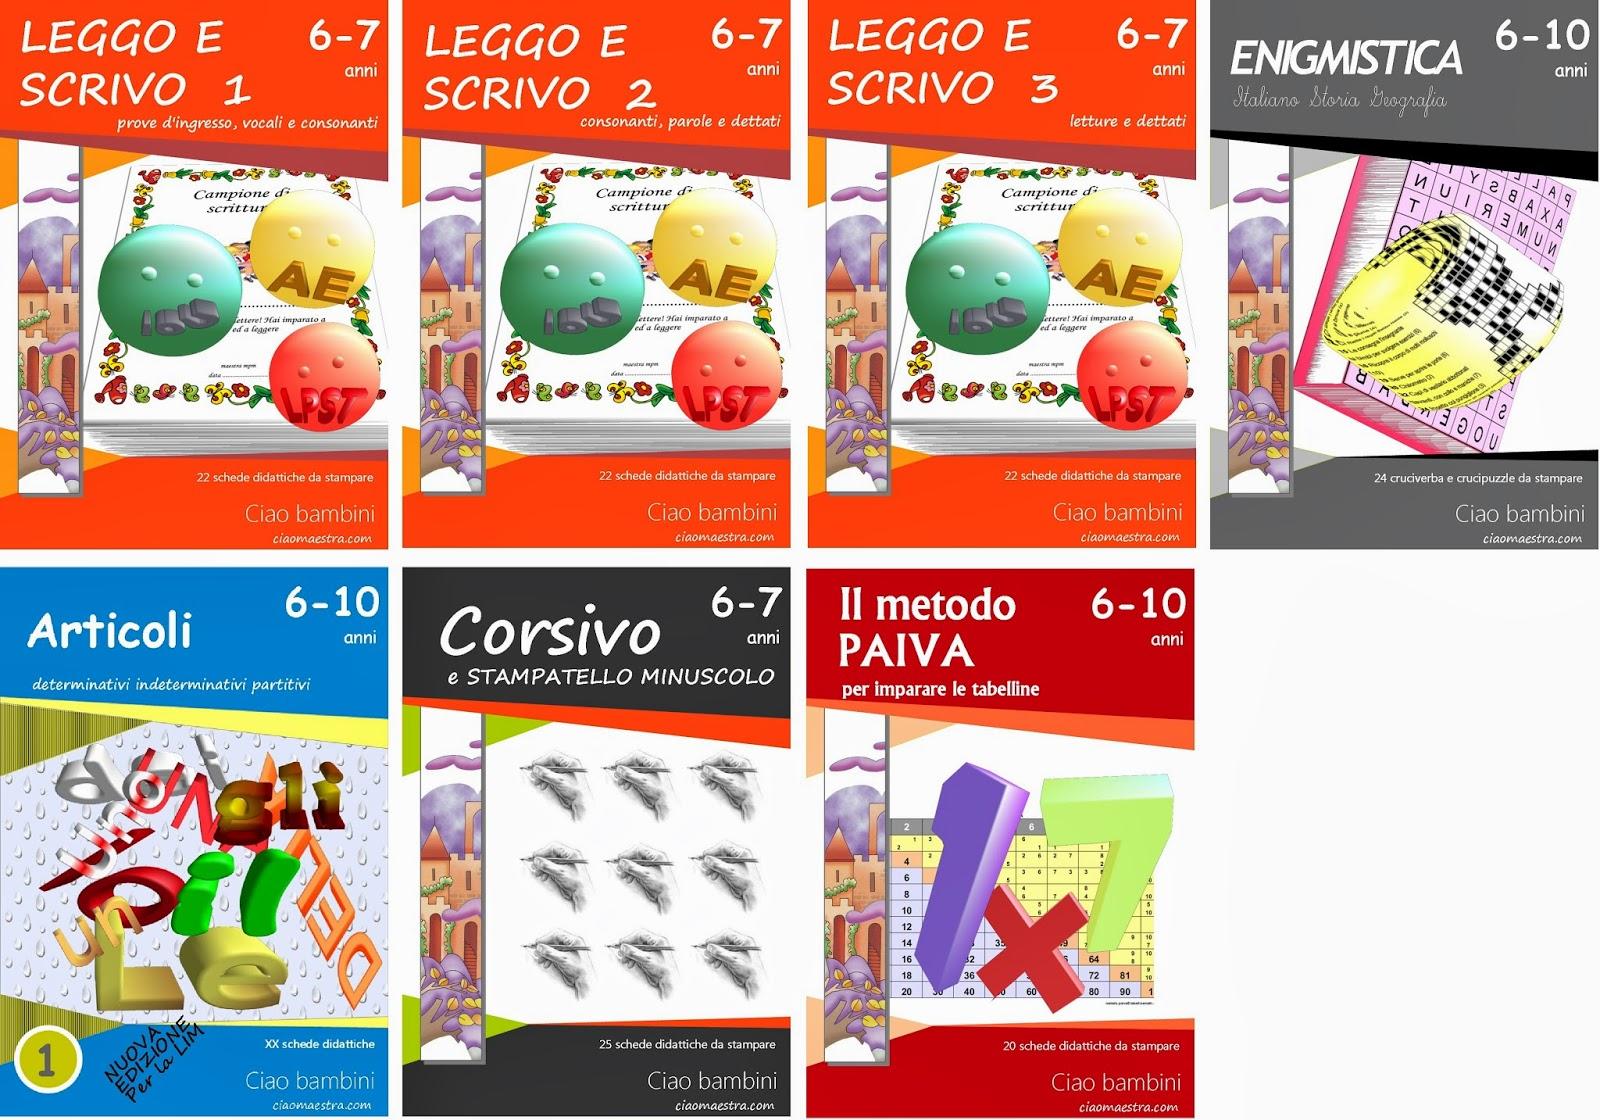 Ciao bambini gli ebook gli altri 7 ebook insieme a 1199 zip 240m fandeluxe Ebook collections